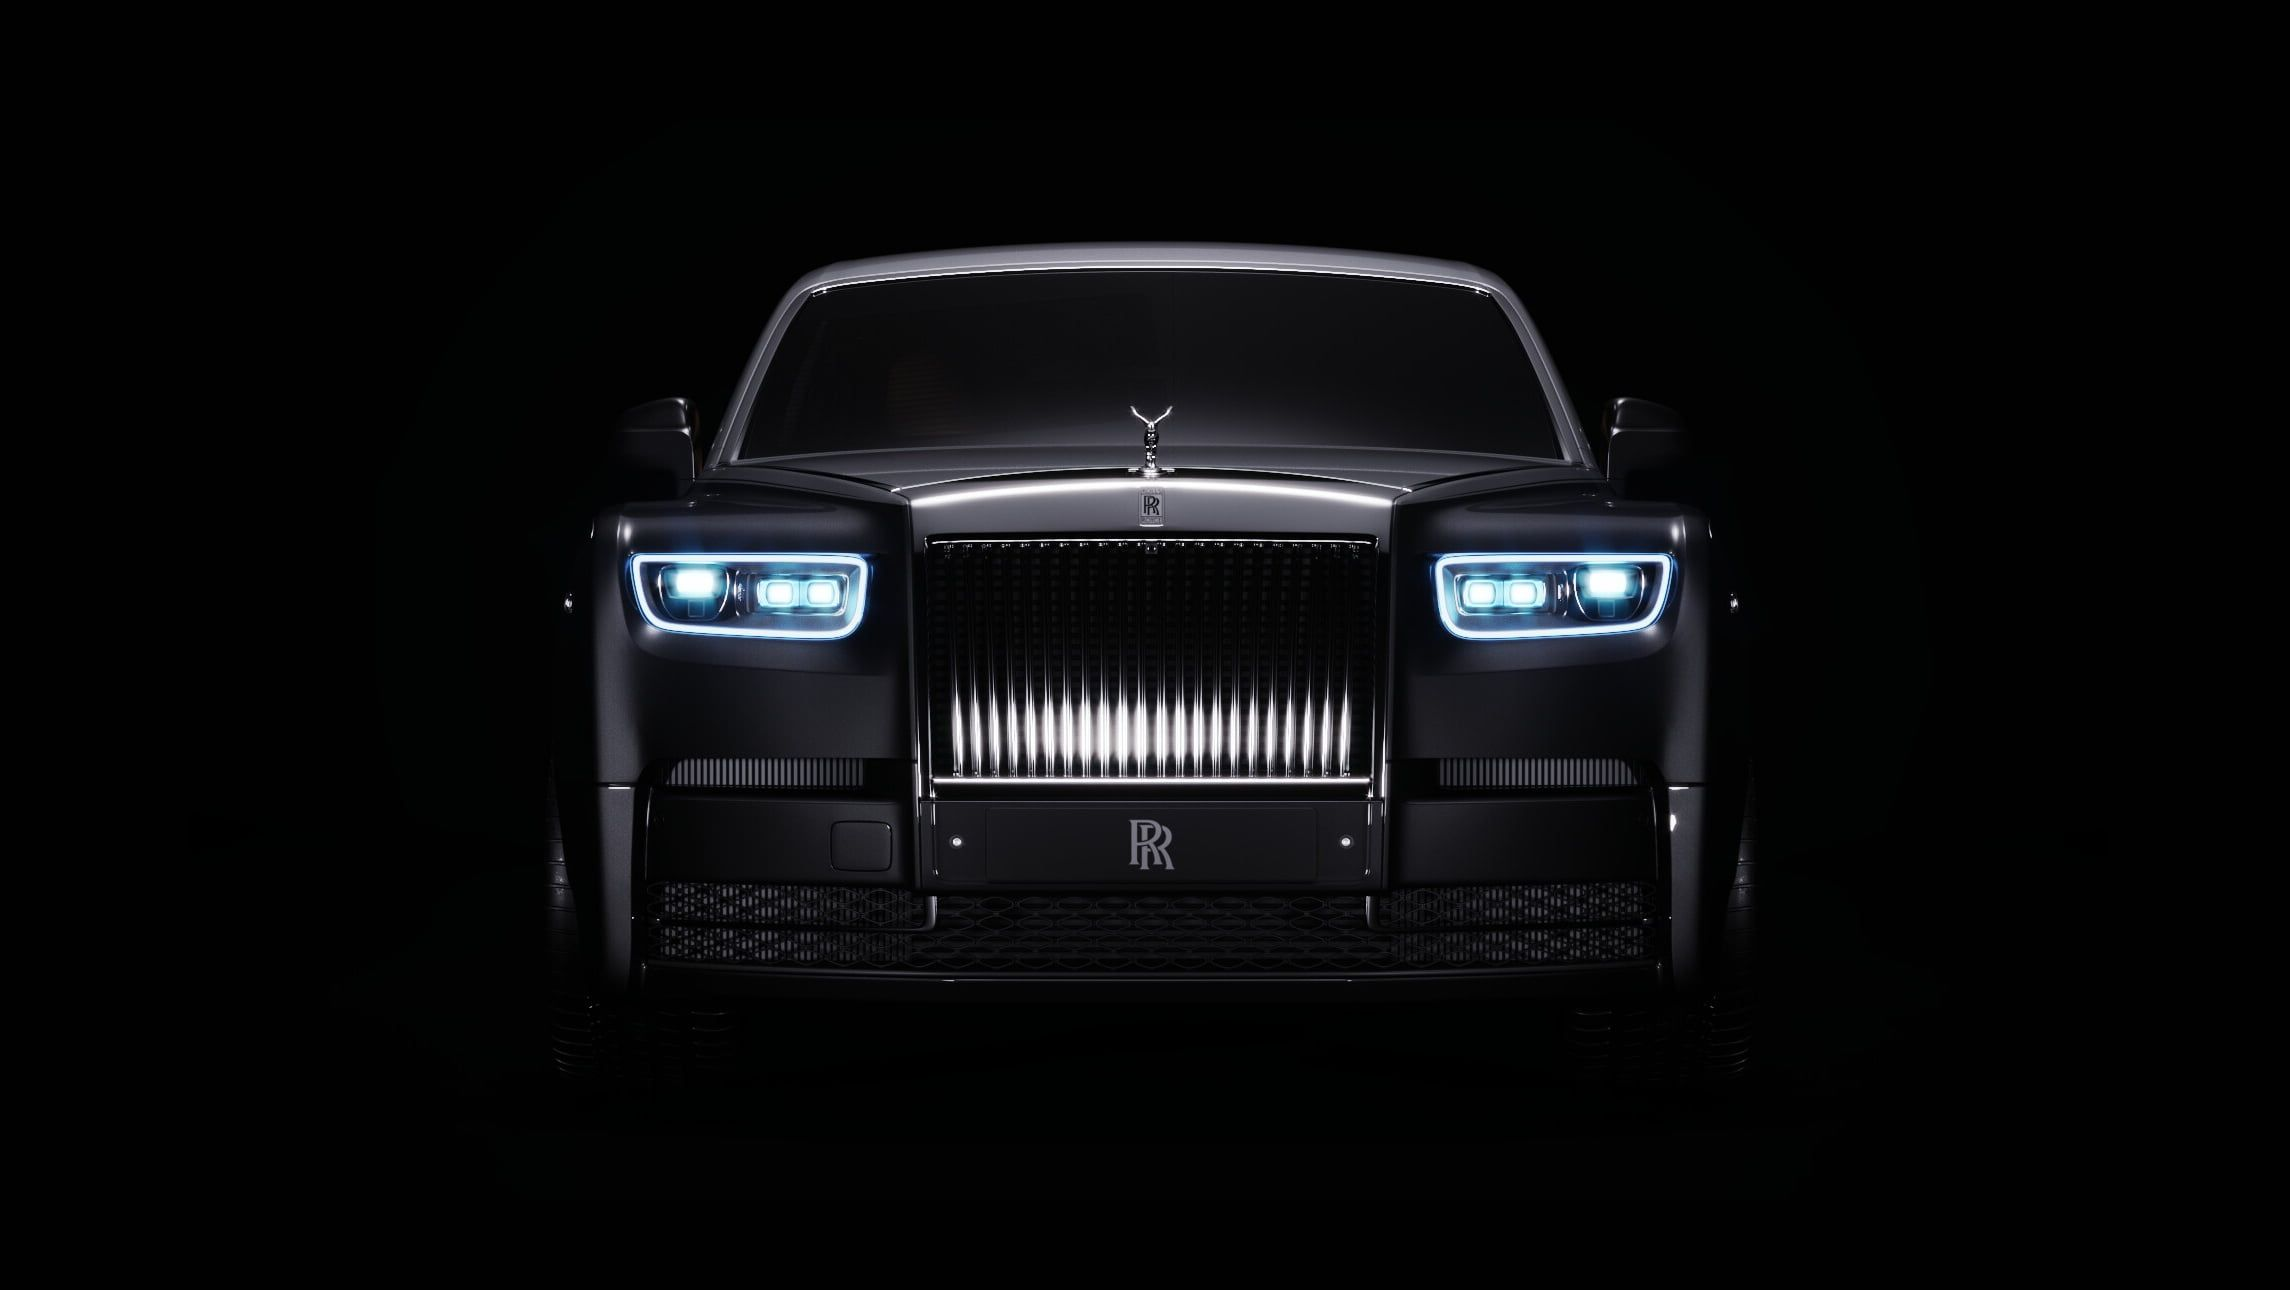 Car Rolls Royce Rolls Royce Phantom Black Cars Vehicle Simple Background 1080p Wallpaper Hdwallpaper Desktop Rolls Royce Phantom Rolls Royce Black Car